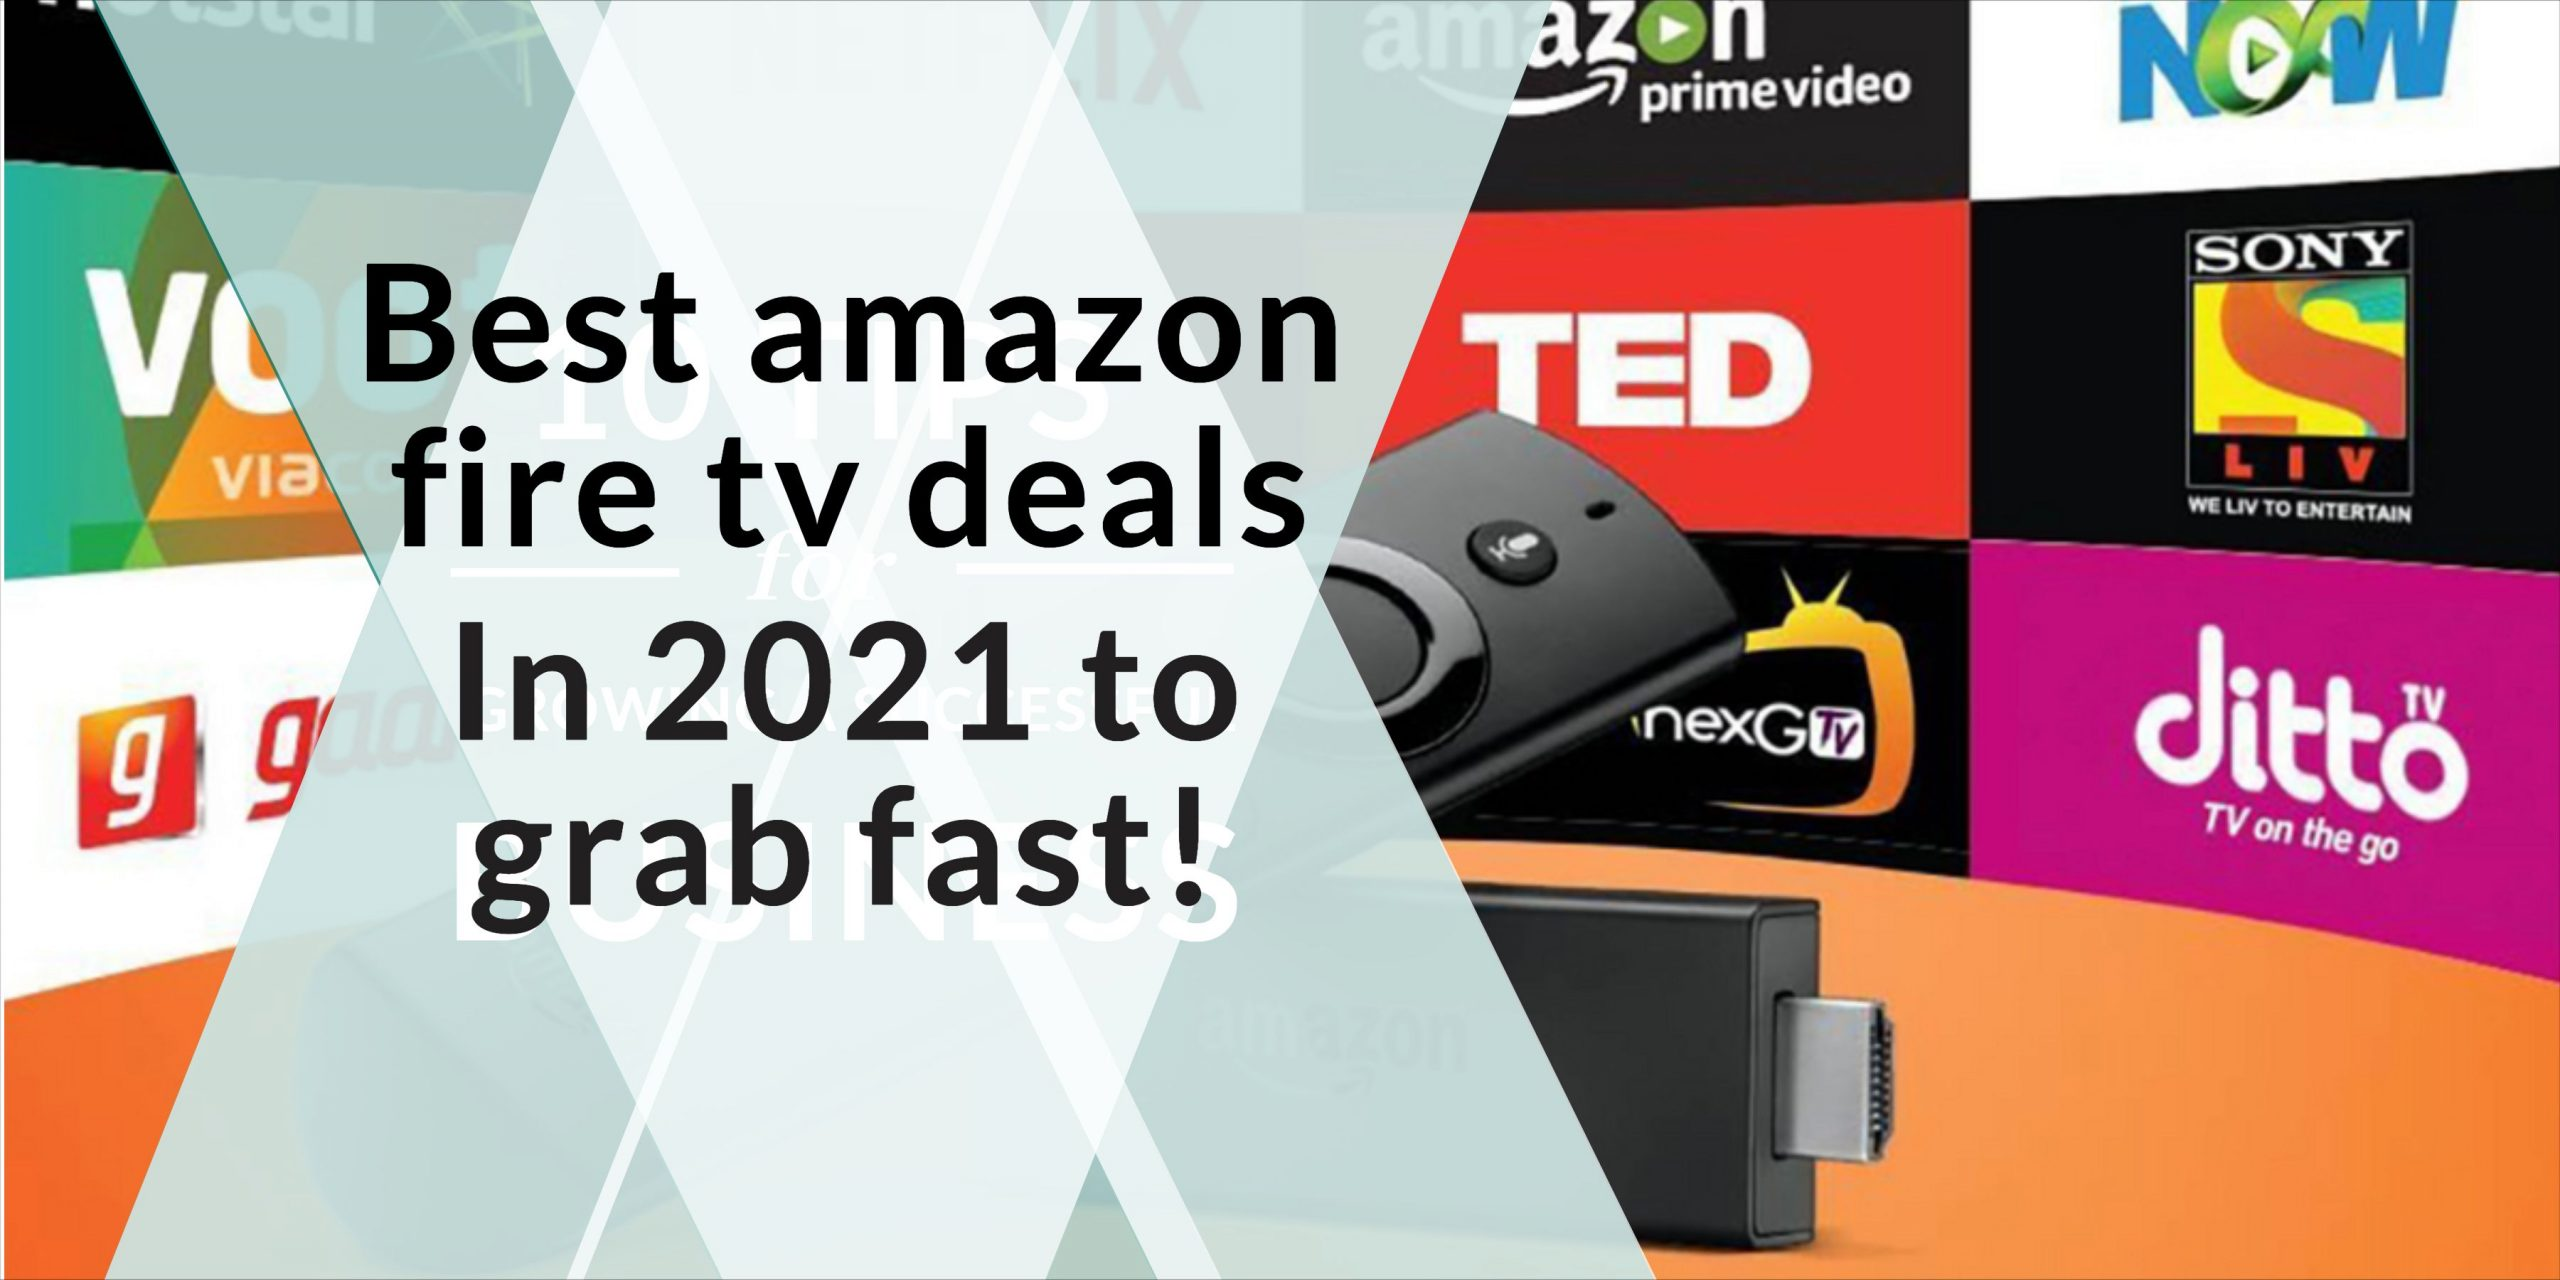 best deal on amazon fire stick